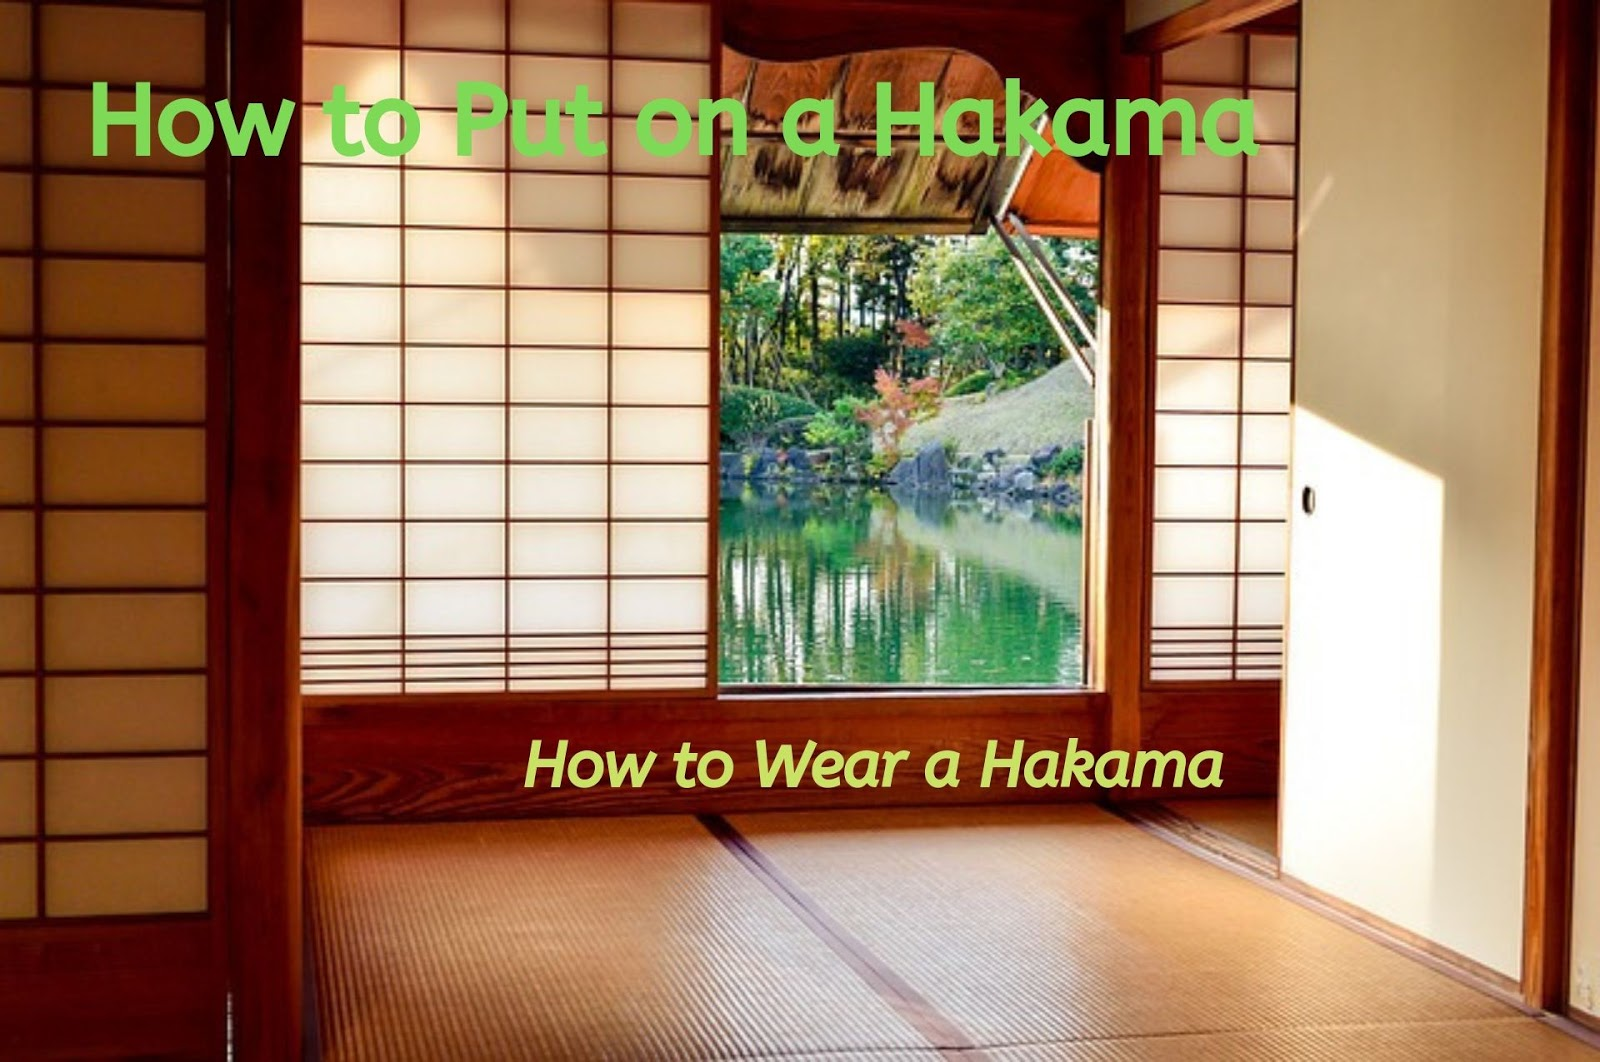 How to Put on a Hakama